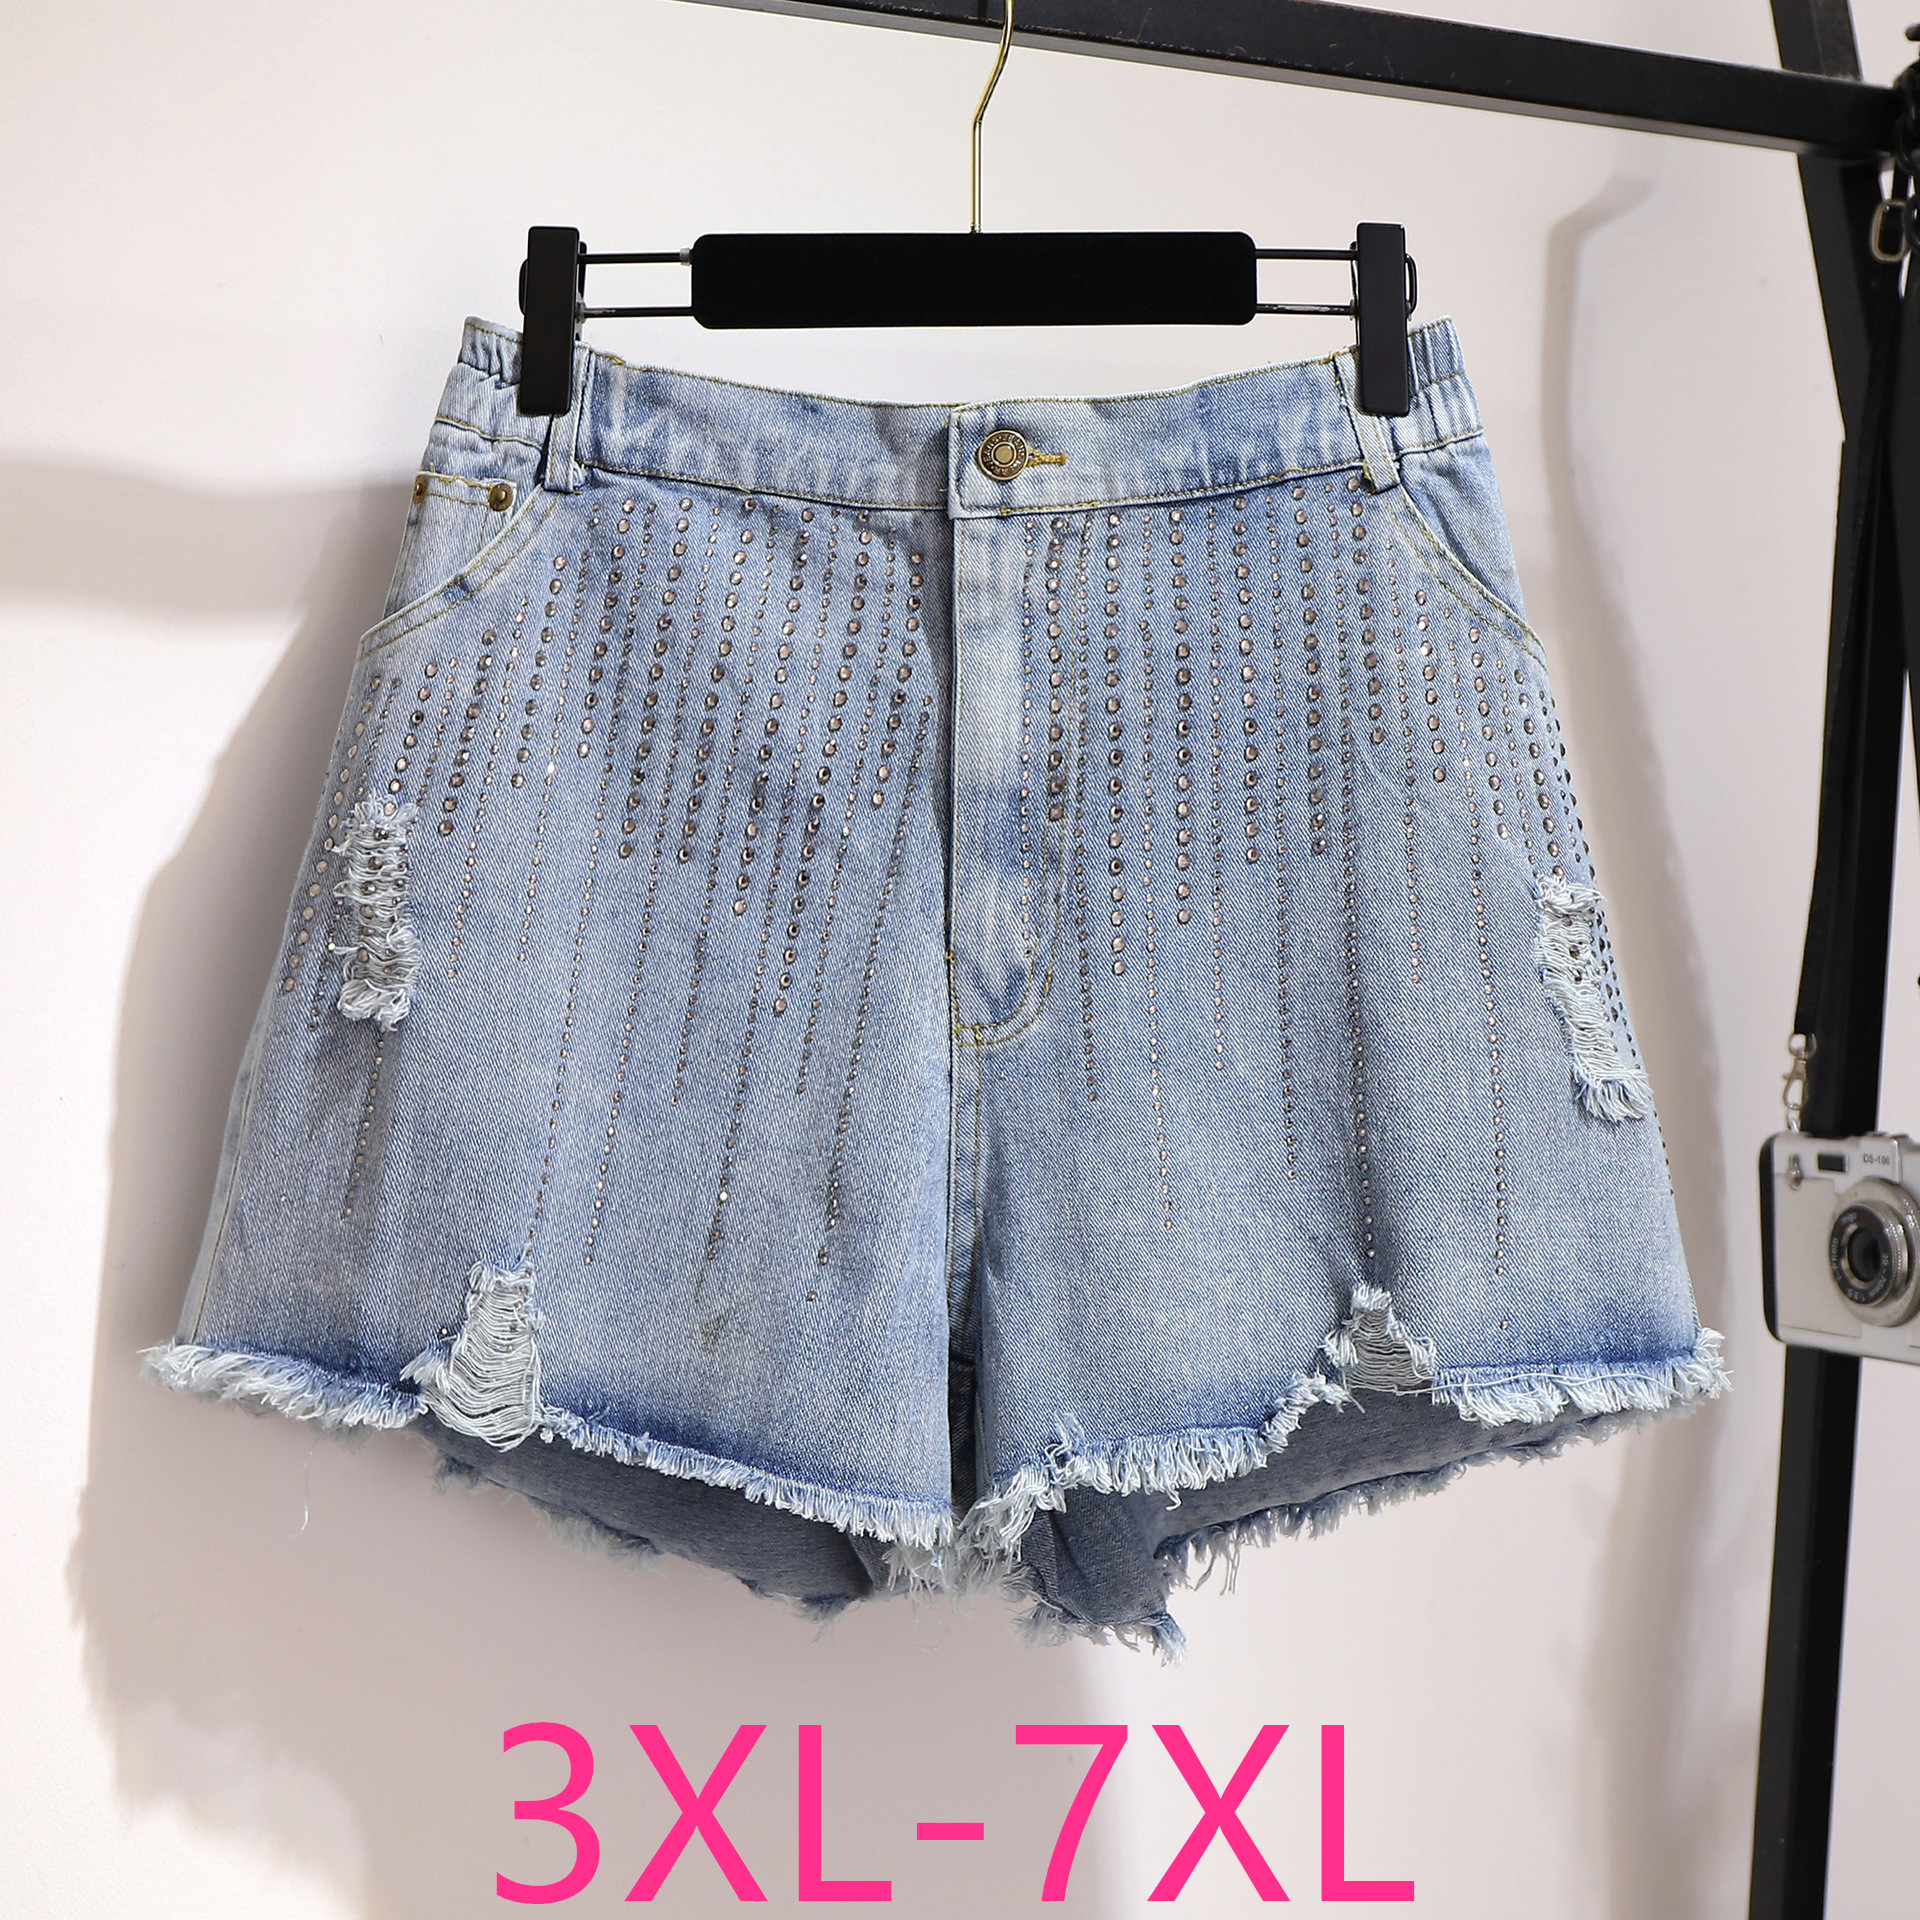 2020 Spring Summer Plus Size Denim Shorts For Women Large Loose Casual Elastic Waist Hole Wide Leg Shorts Blue 4XL 5XL 6XL 7XL